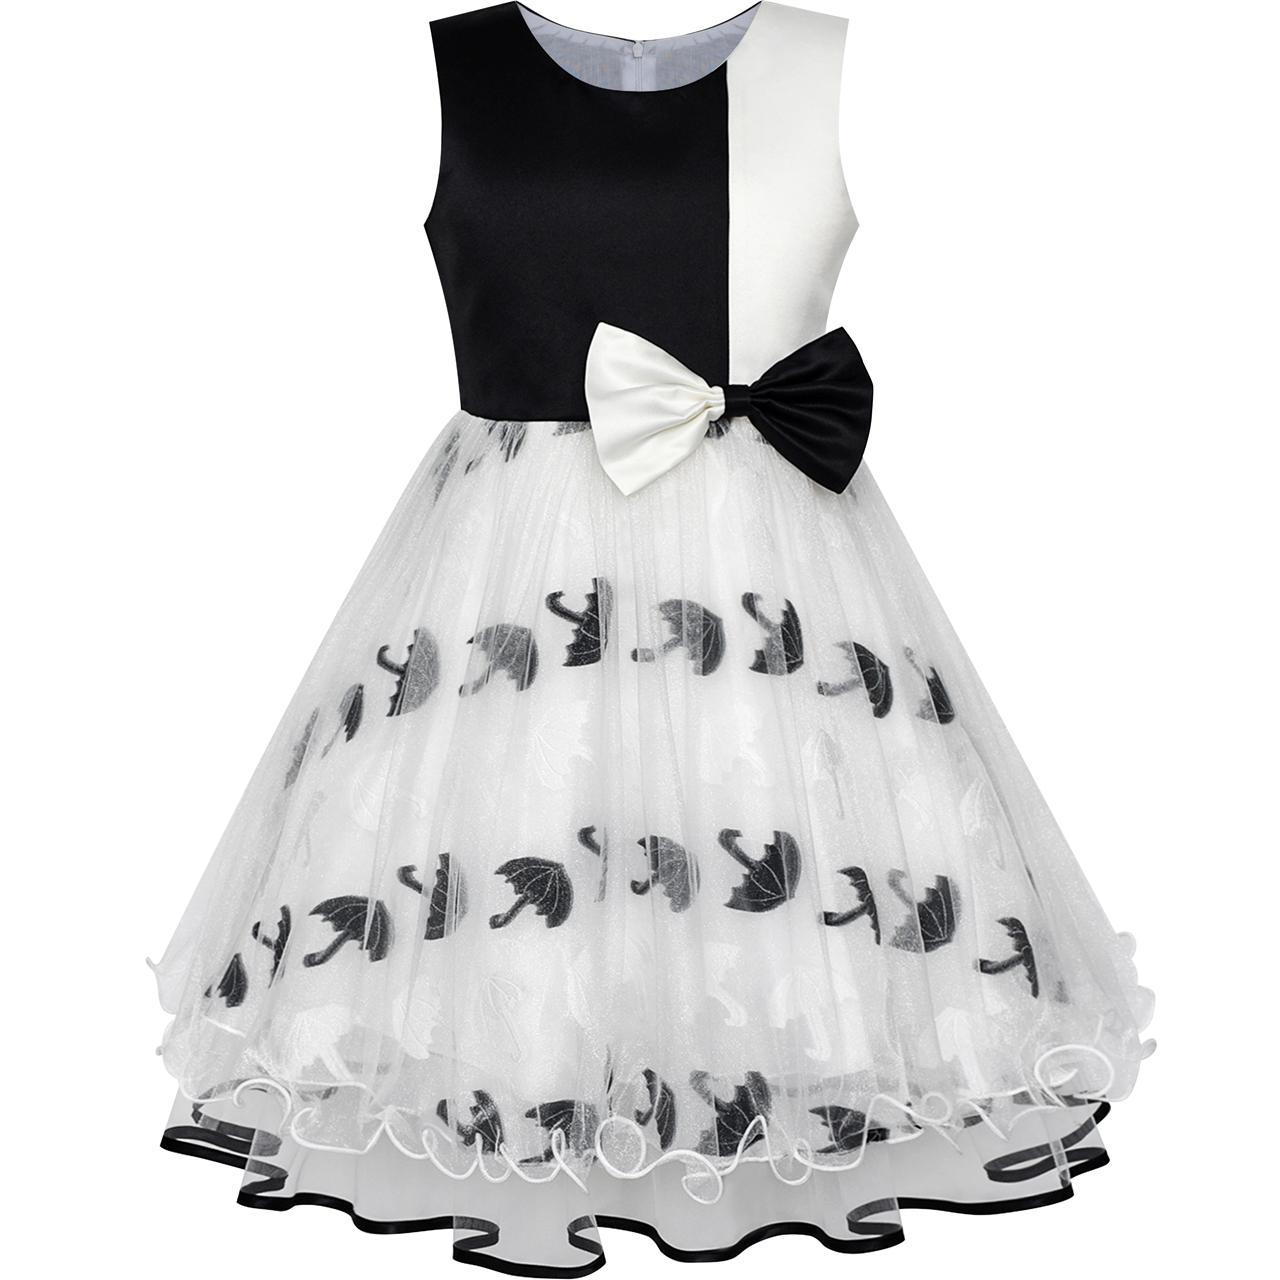 Sunny Fashion Vestido Menina Gravata-borboleta Negro Branco Contraste de cor Guarda-chuva Sundress